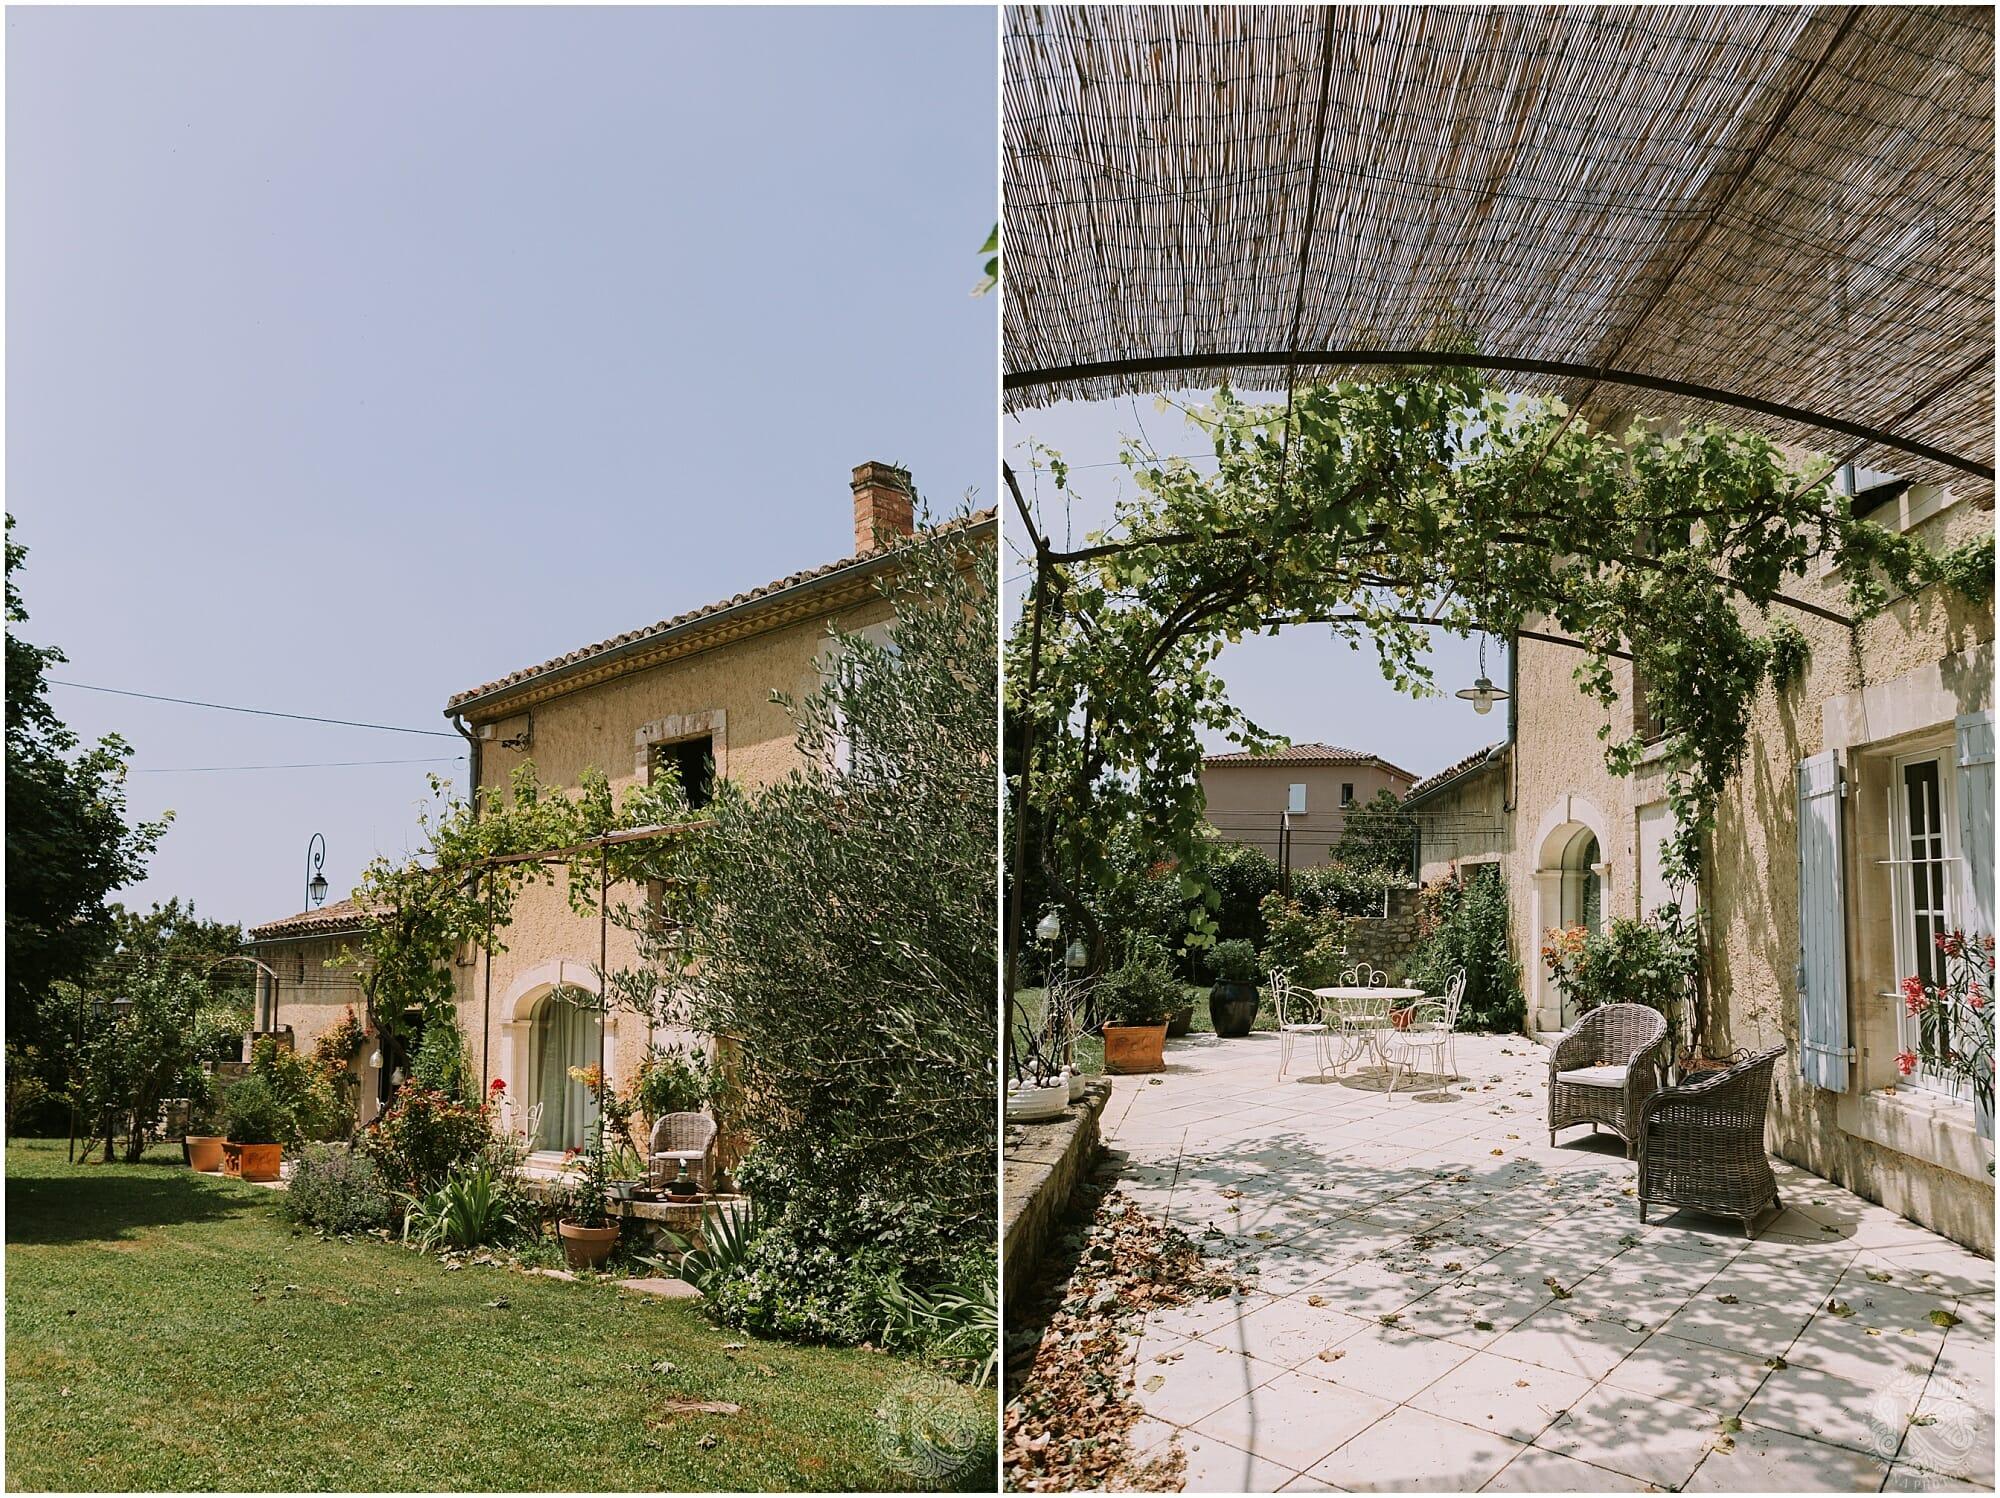 Kateryna-photos-photographe-mariage-chateau-des-3-fontaines-provence-avignon-vaucluse-sud_0001.jpg